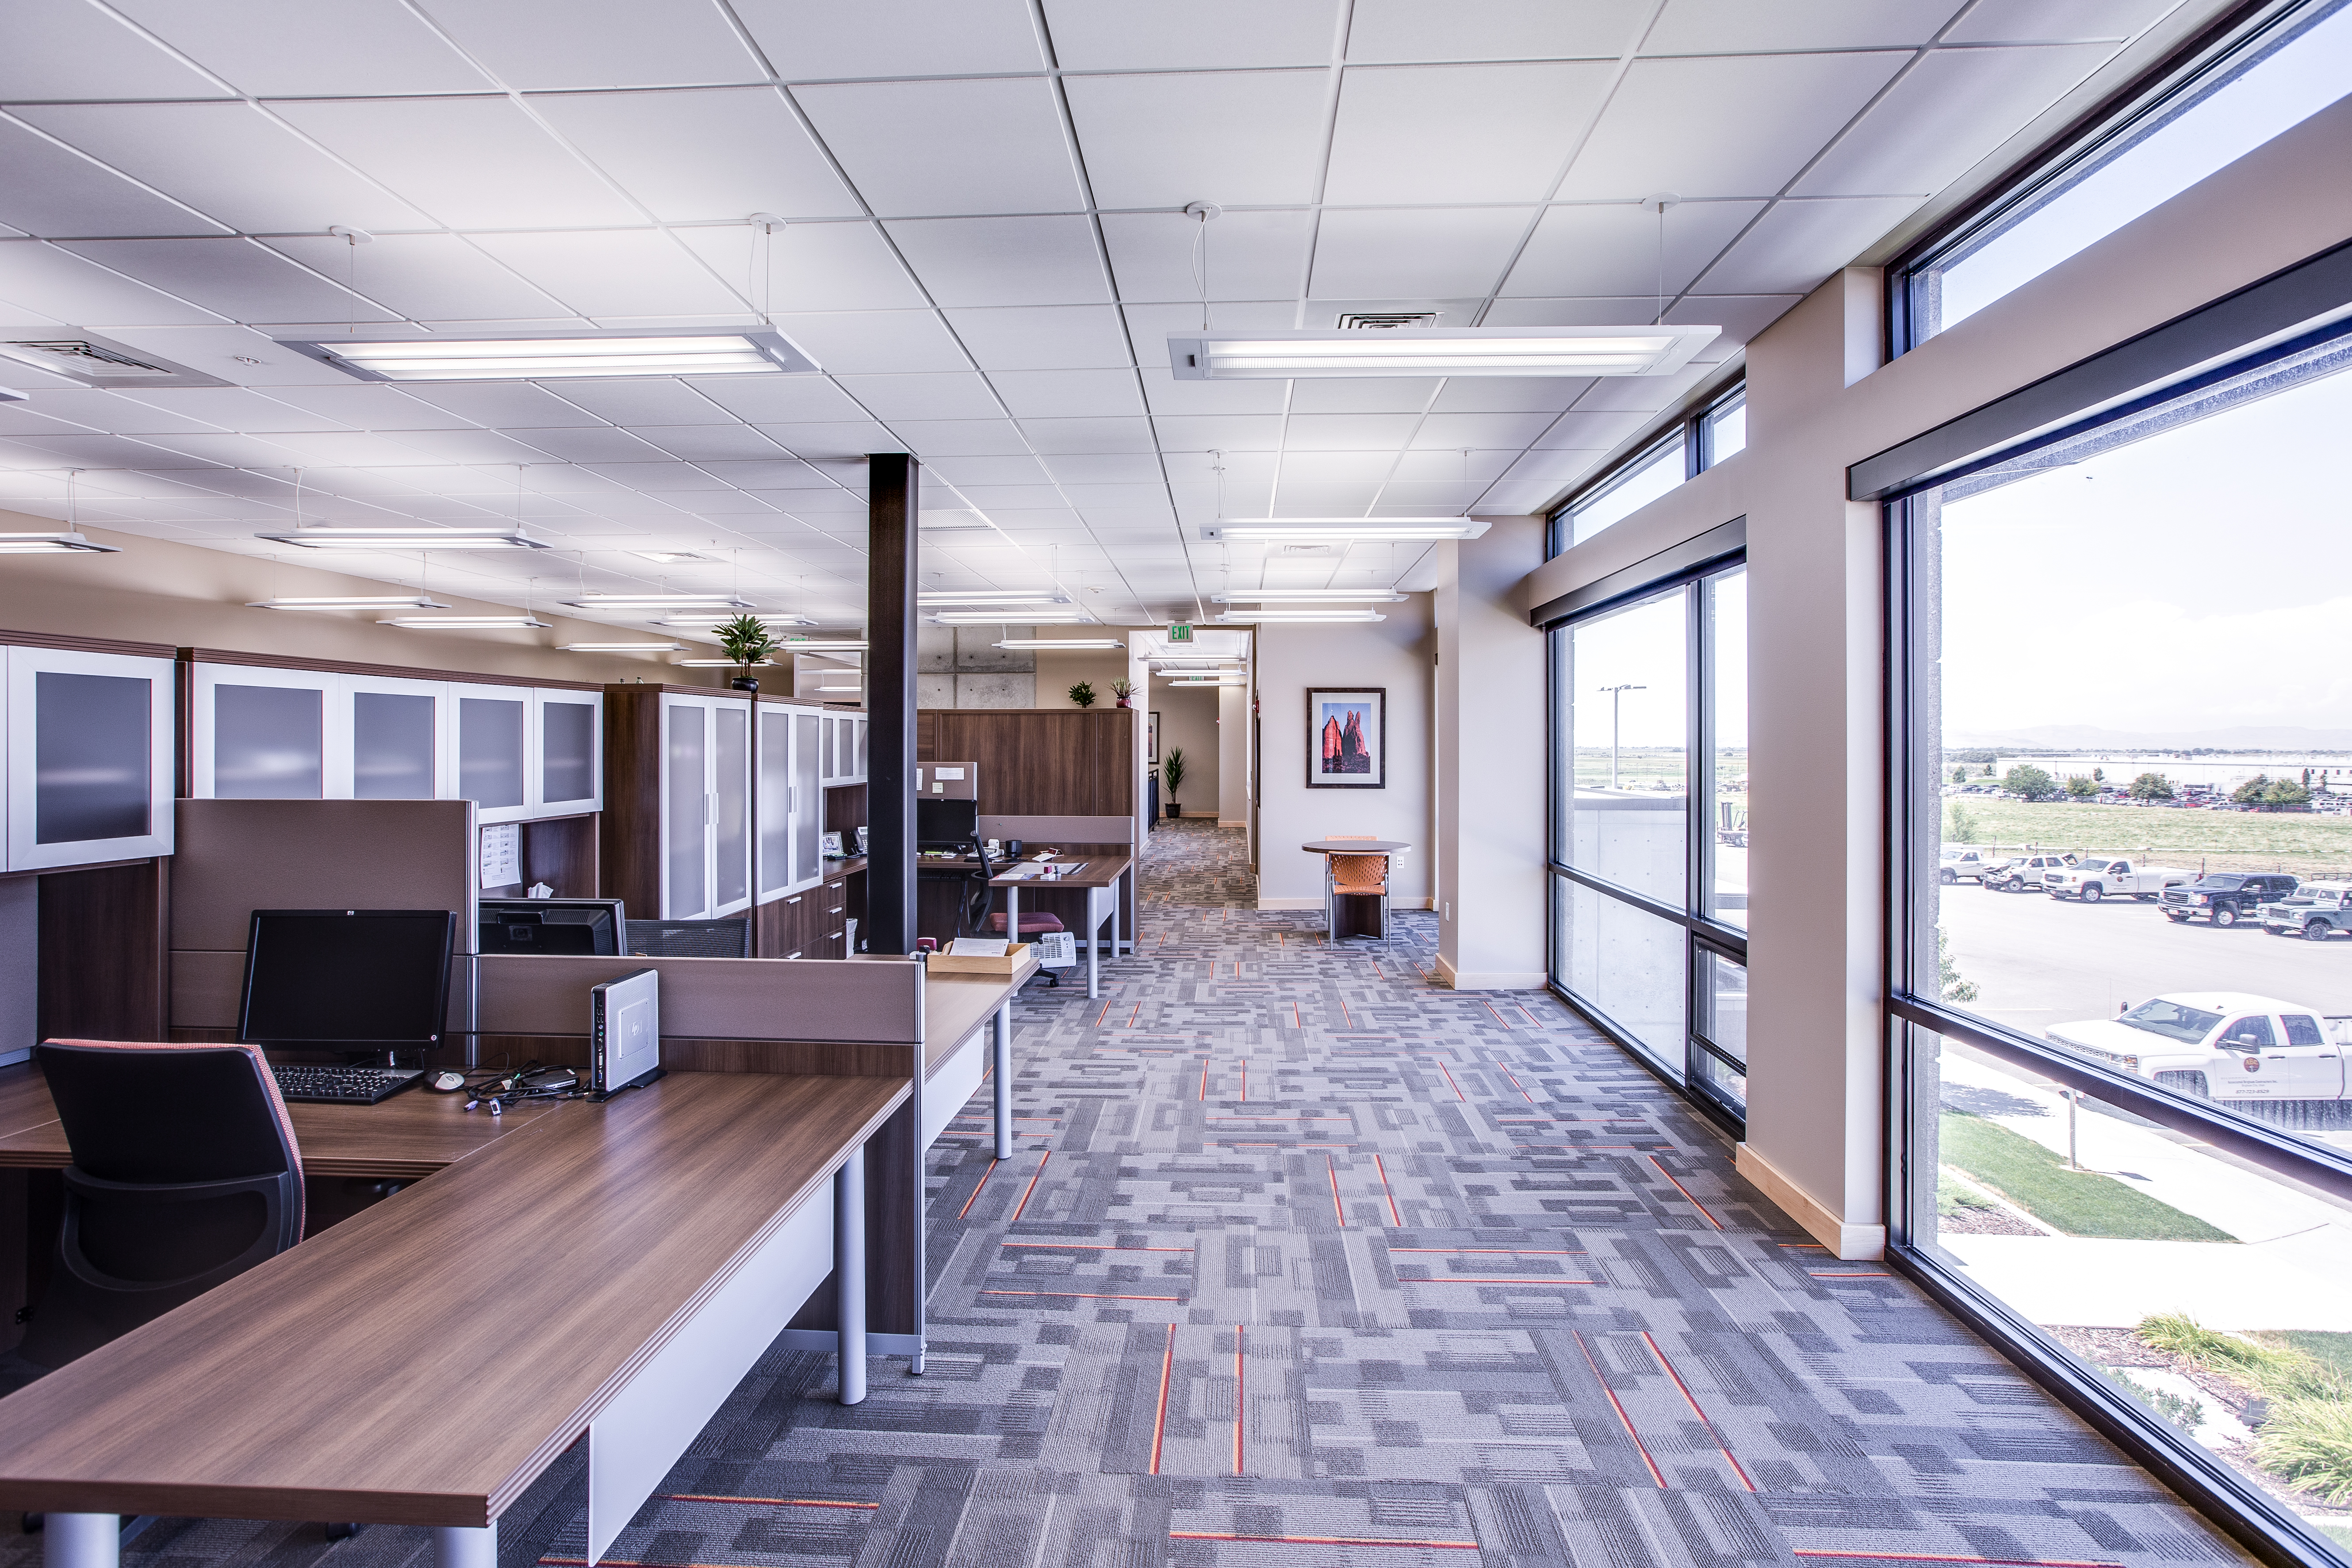 ABC Construction - Brigham City, UT